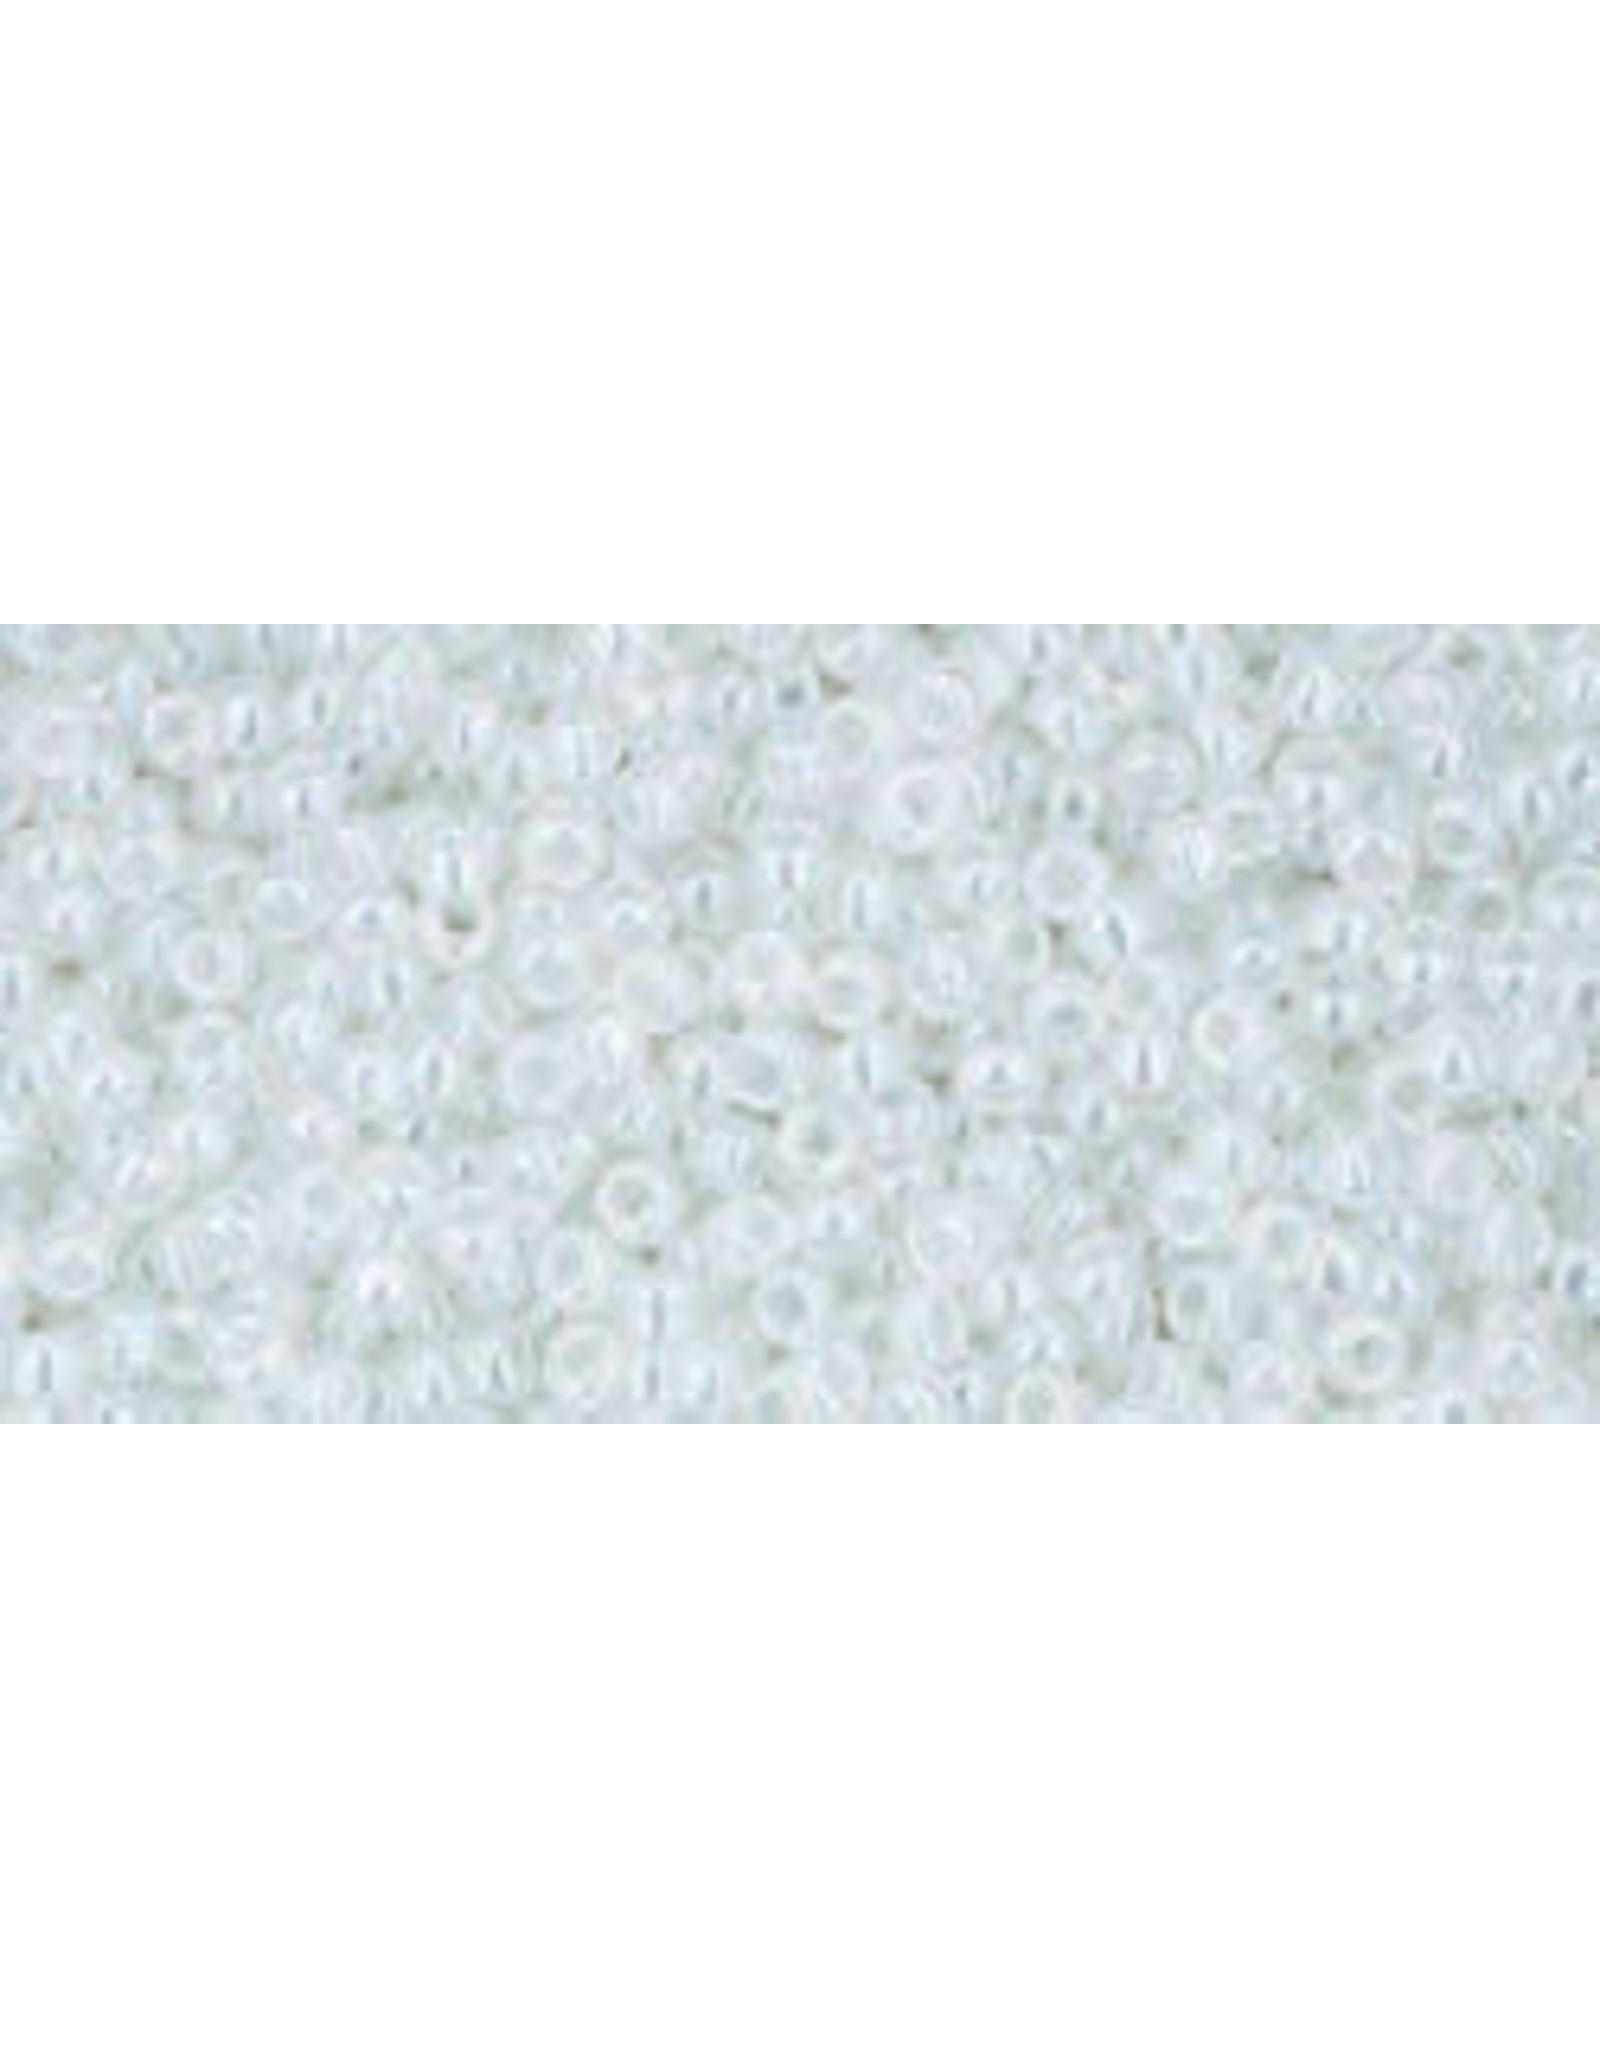 Toho 141 15 Toho Seed 6g   White Ceylon